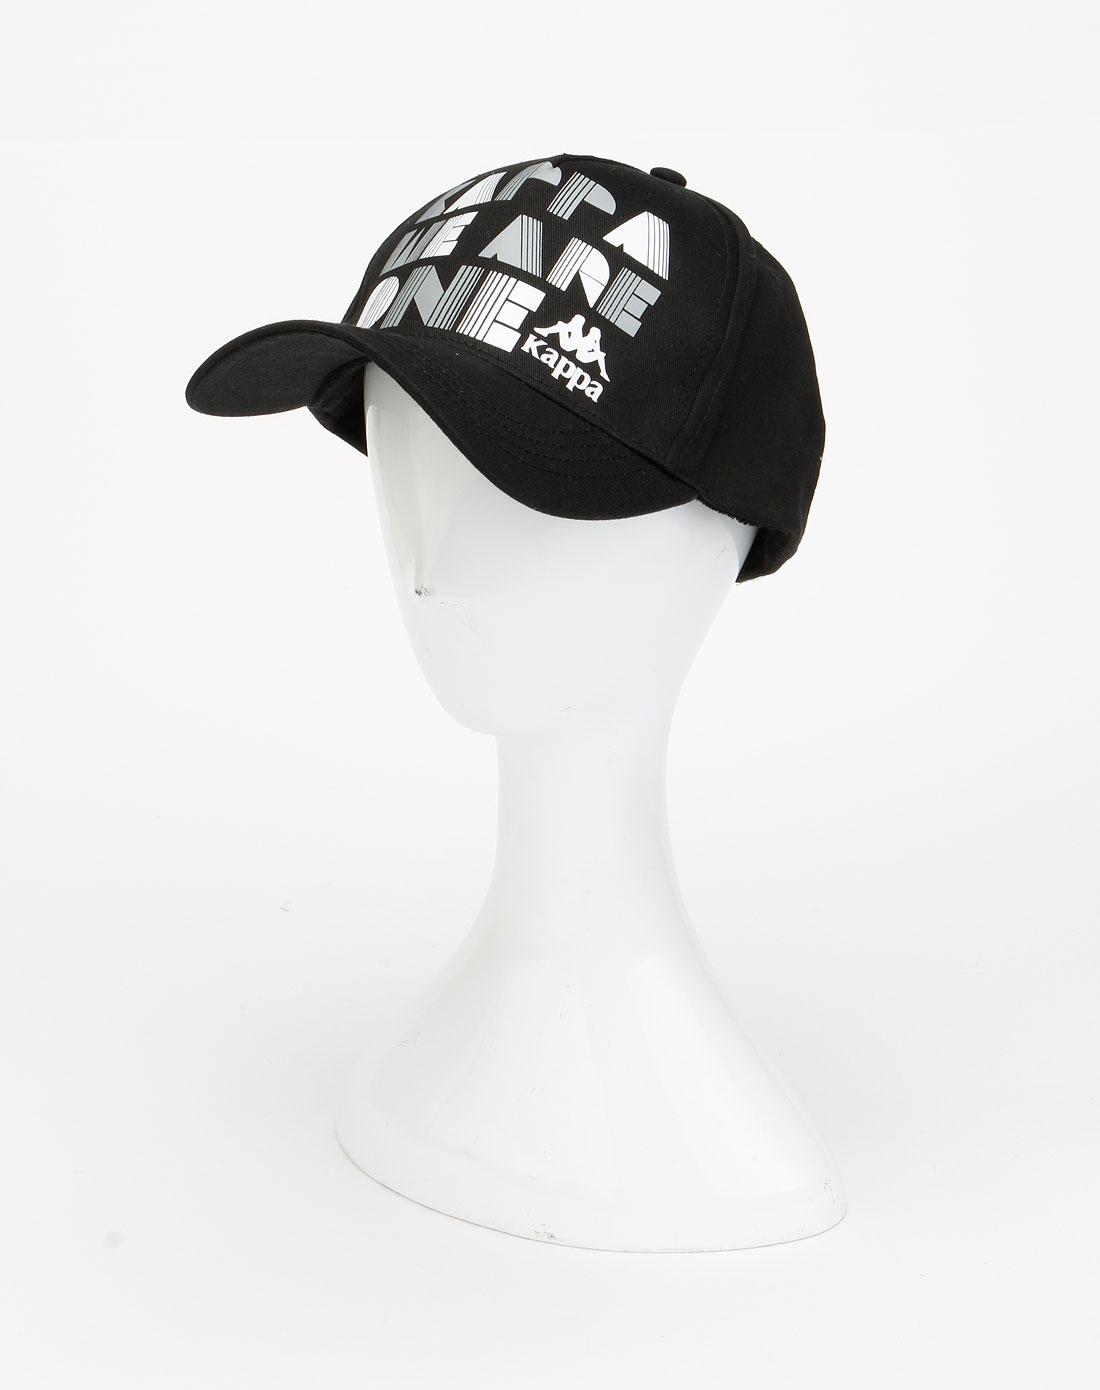 卡帕kappa男装-黑色时尚简约鸭舌帽